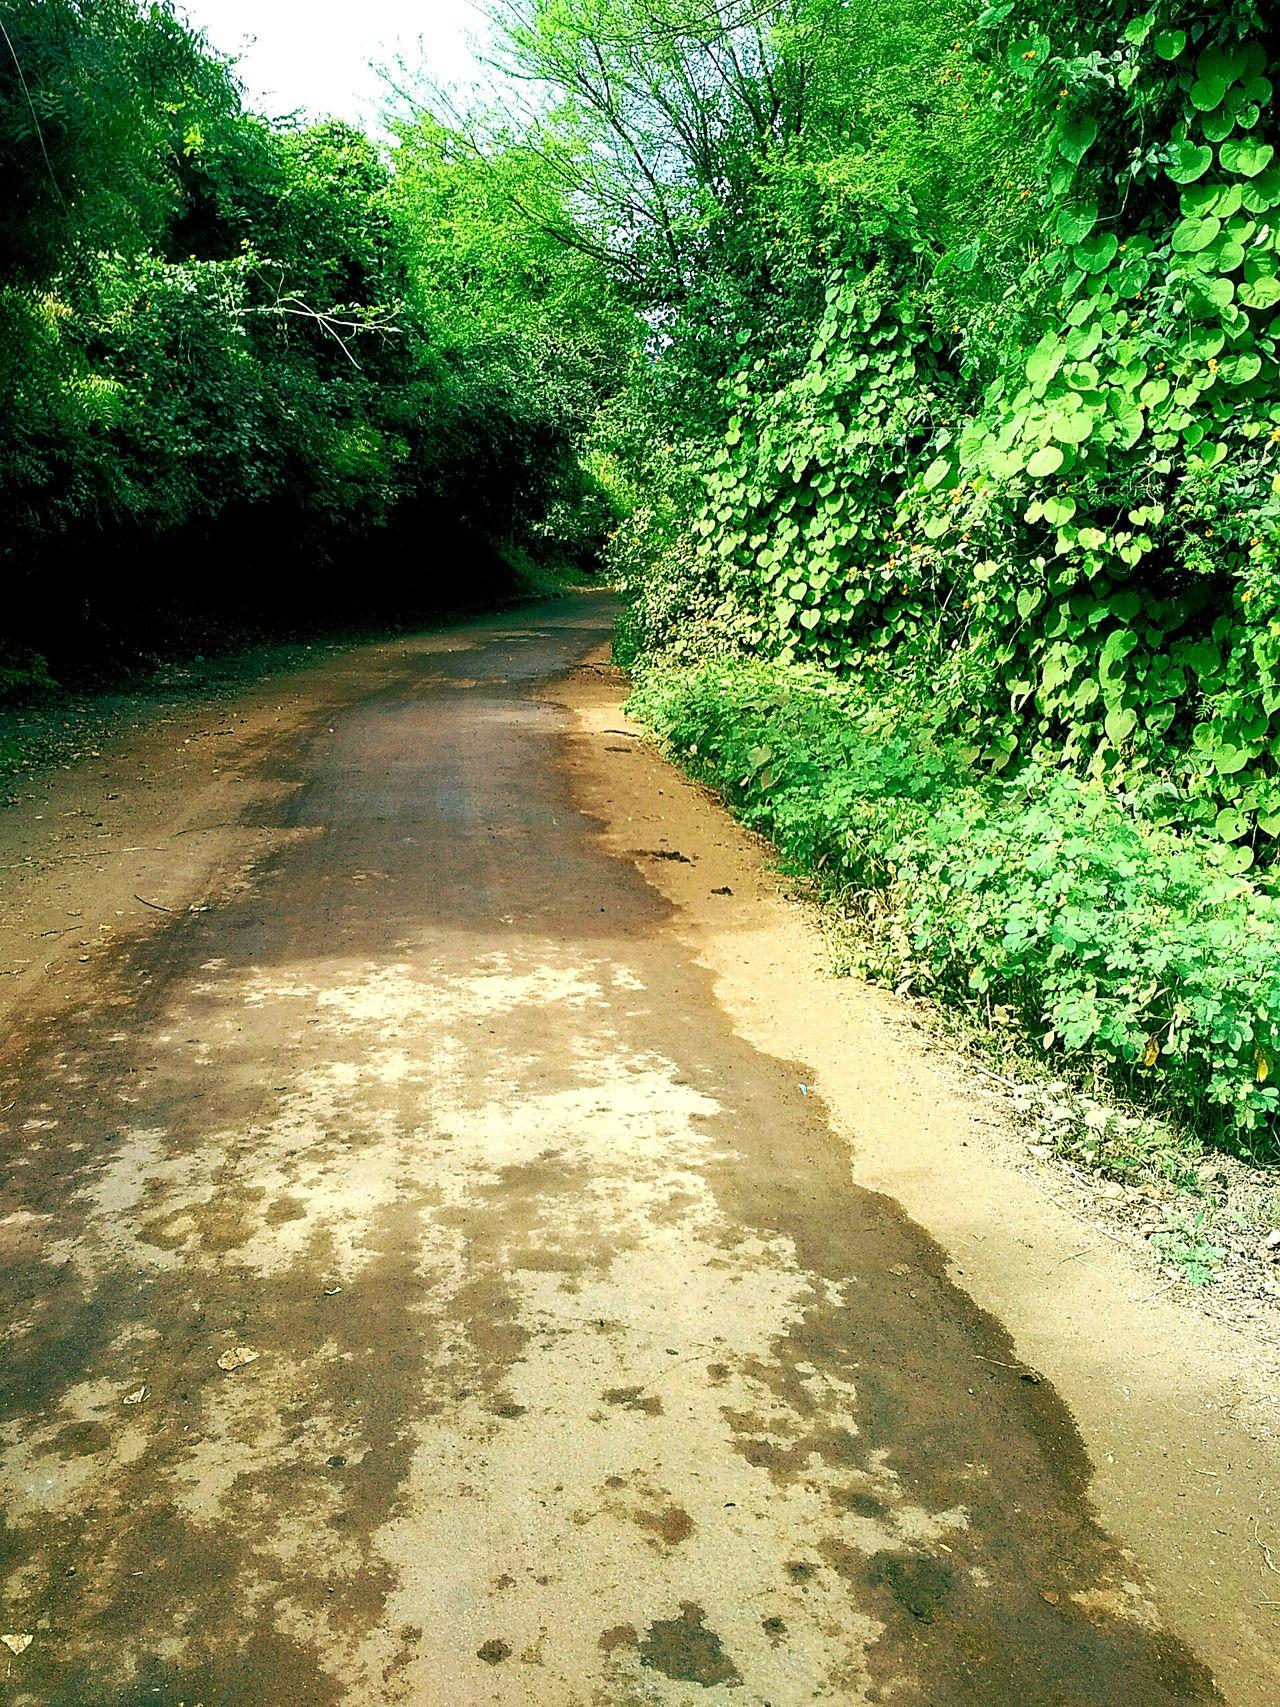 Way To Farm rural scene